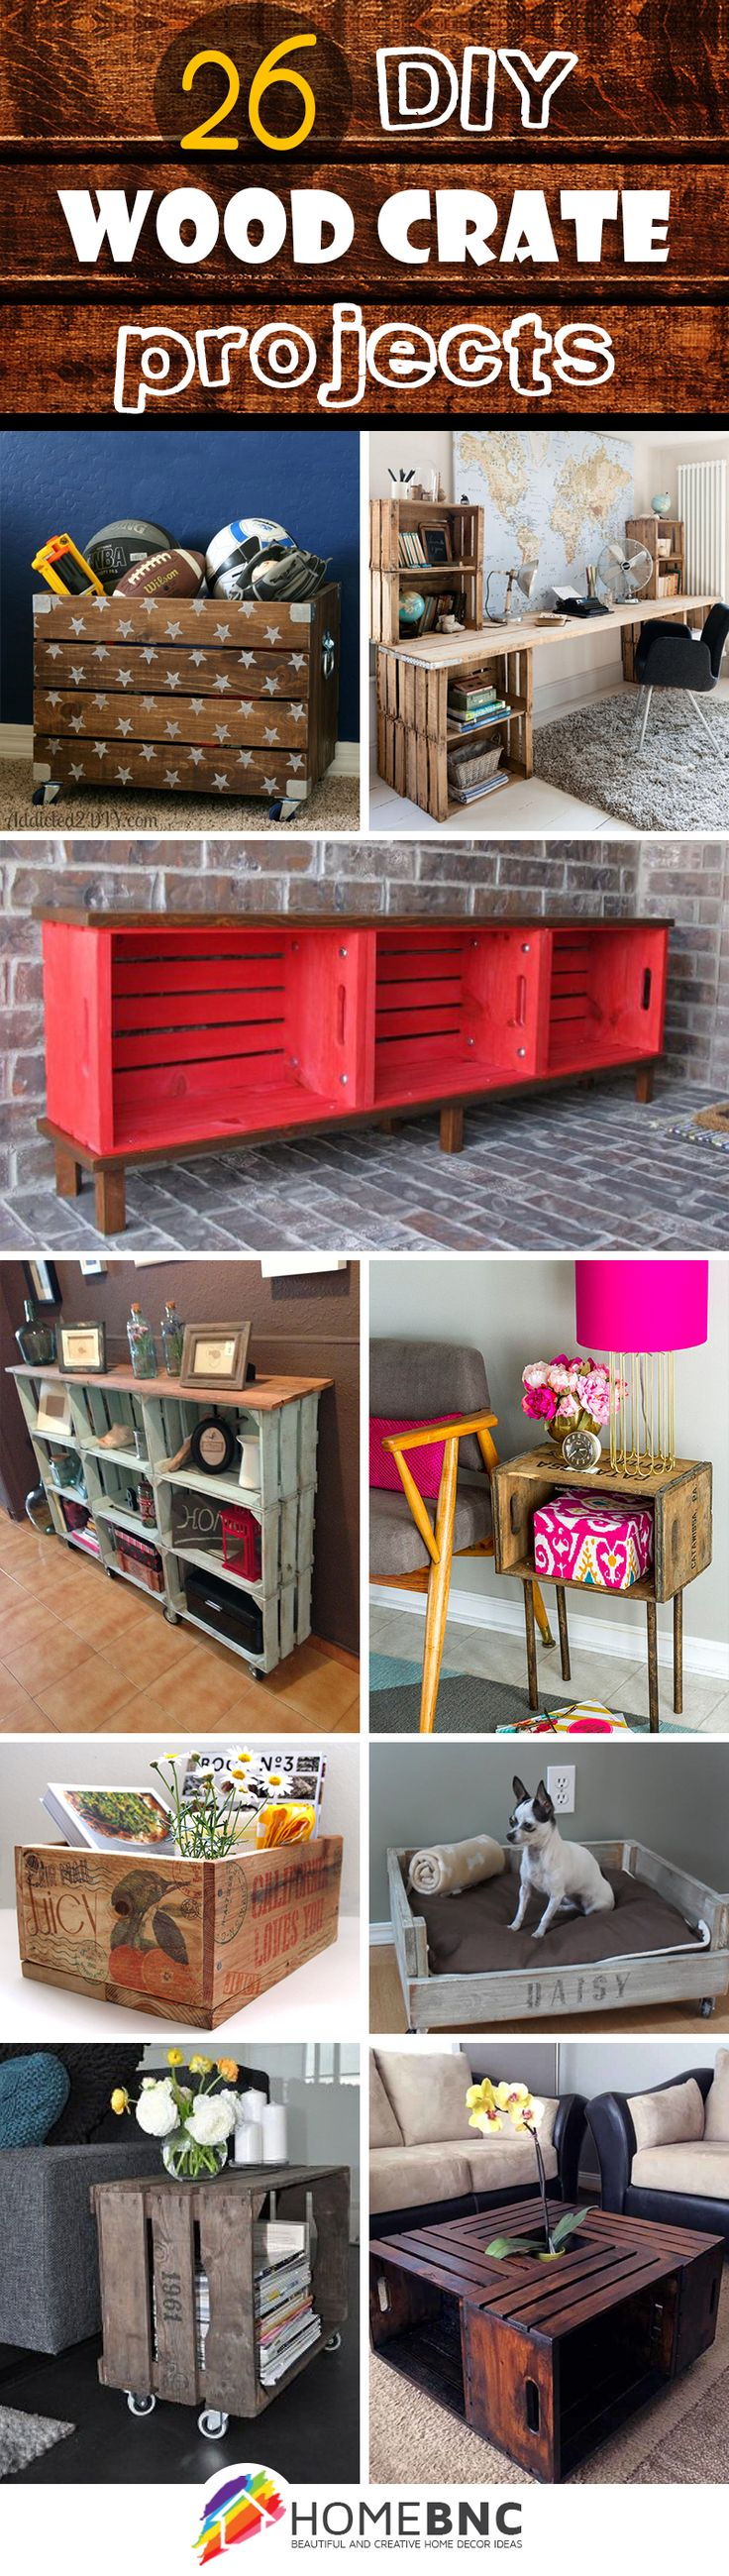 DIY Wood Crate Ideas More